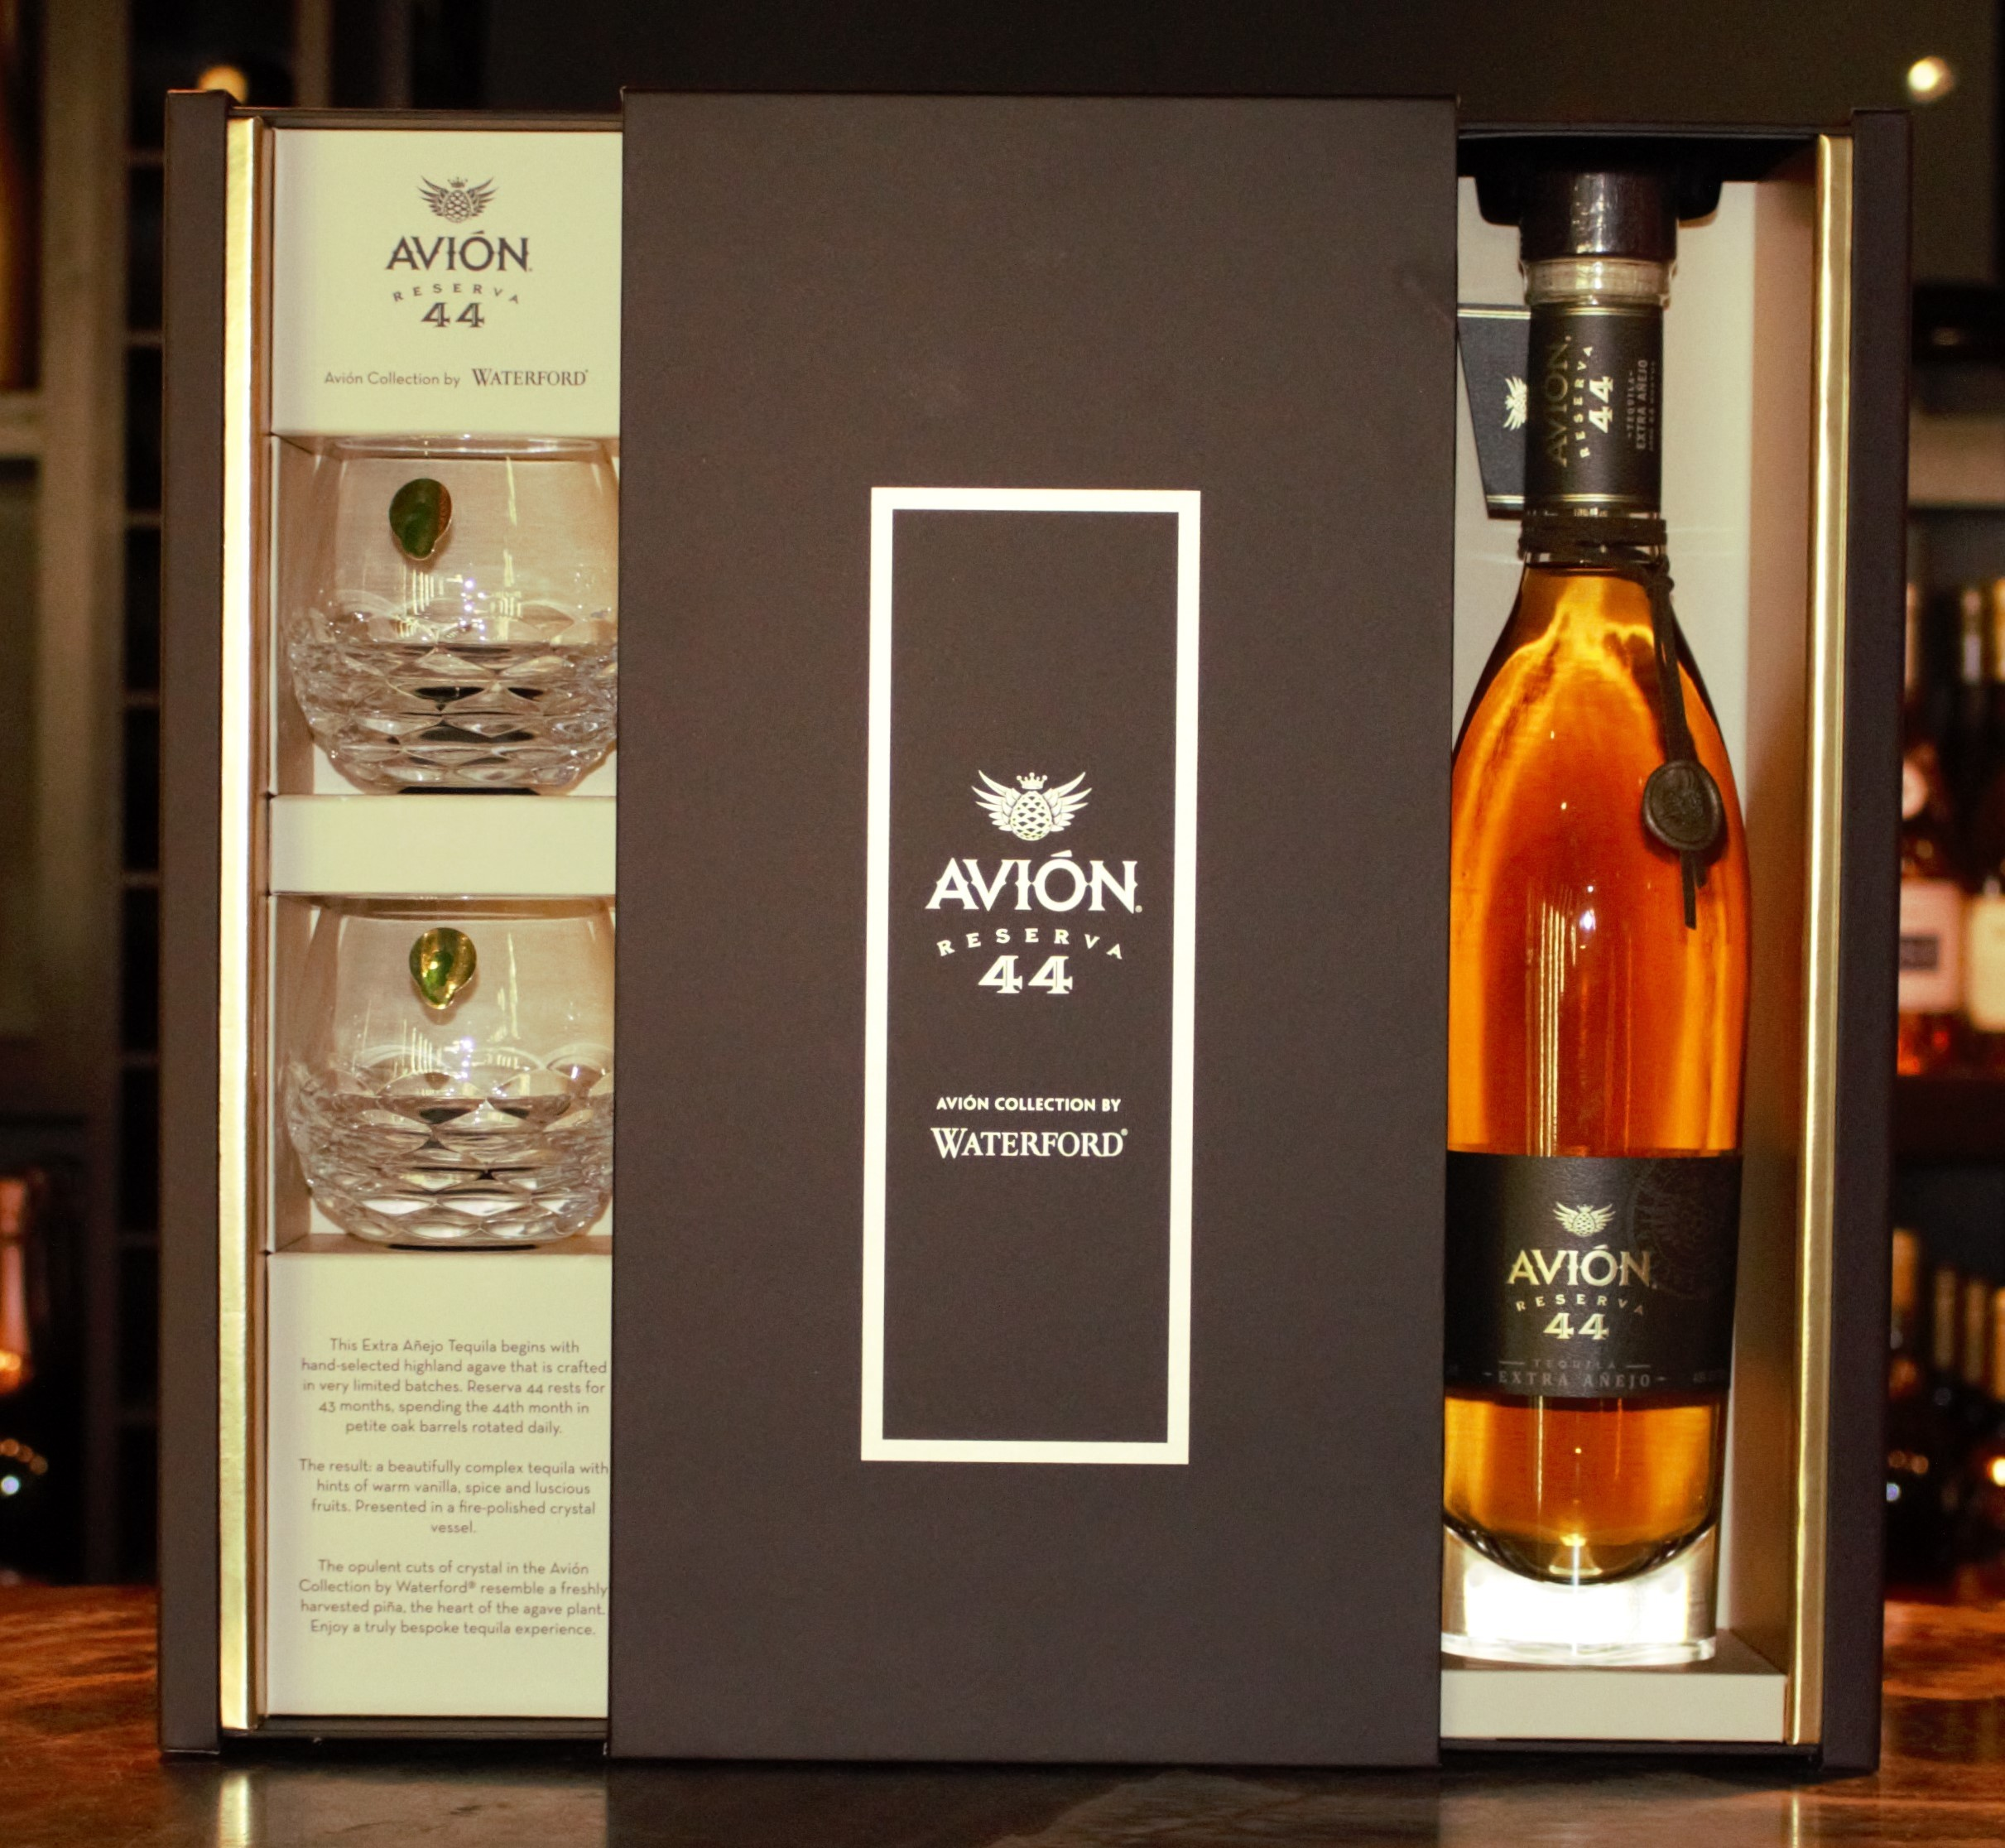 Avion 44 Tequila Extra Anejo Reserve Gft Set W 2 Glasses 750ml Liquor Store Online